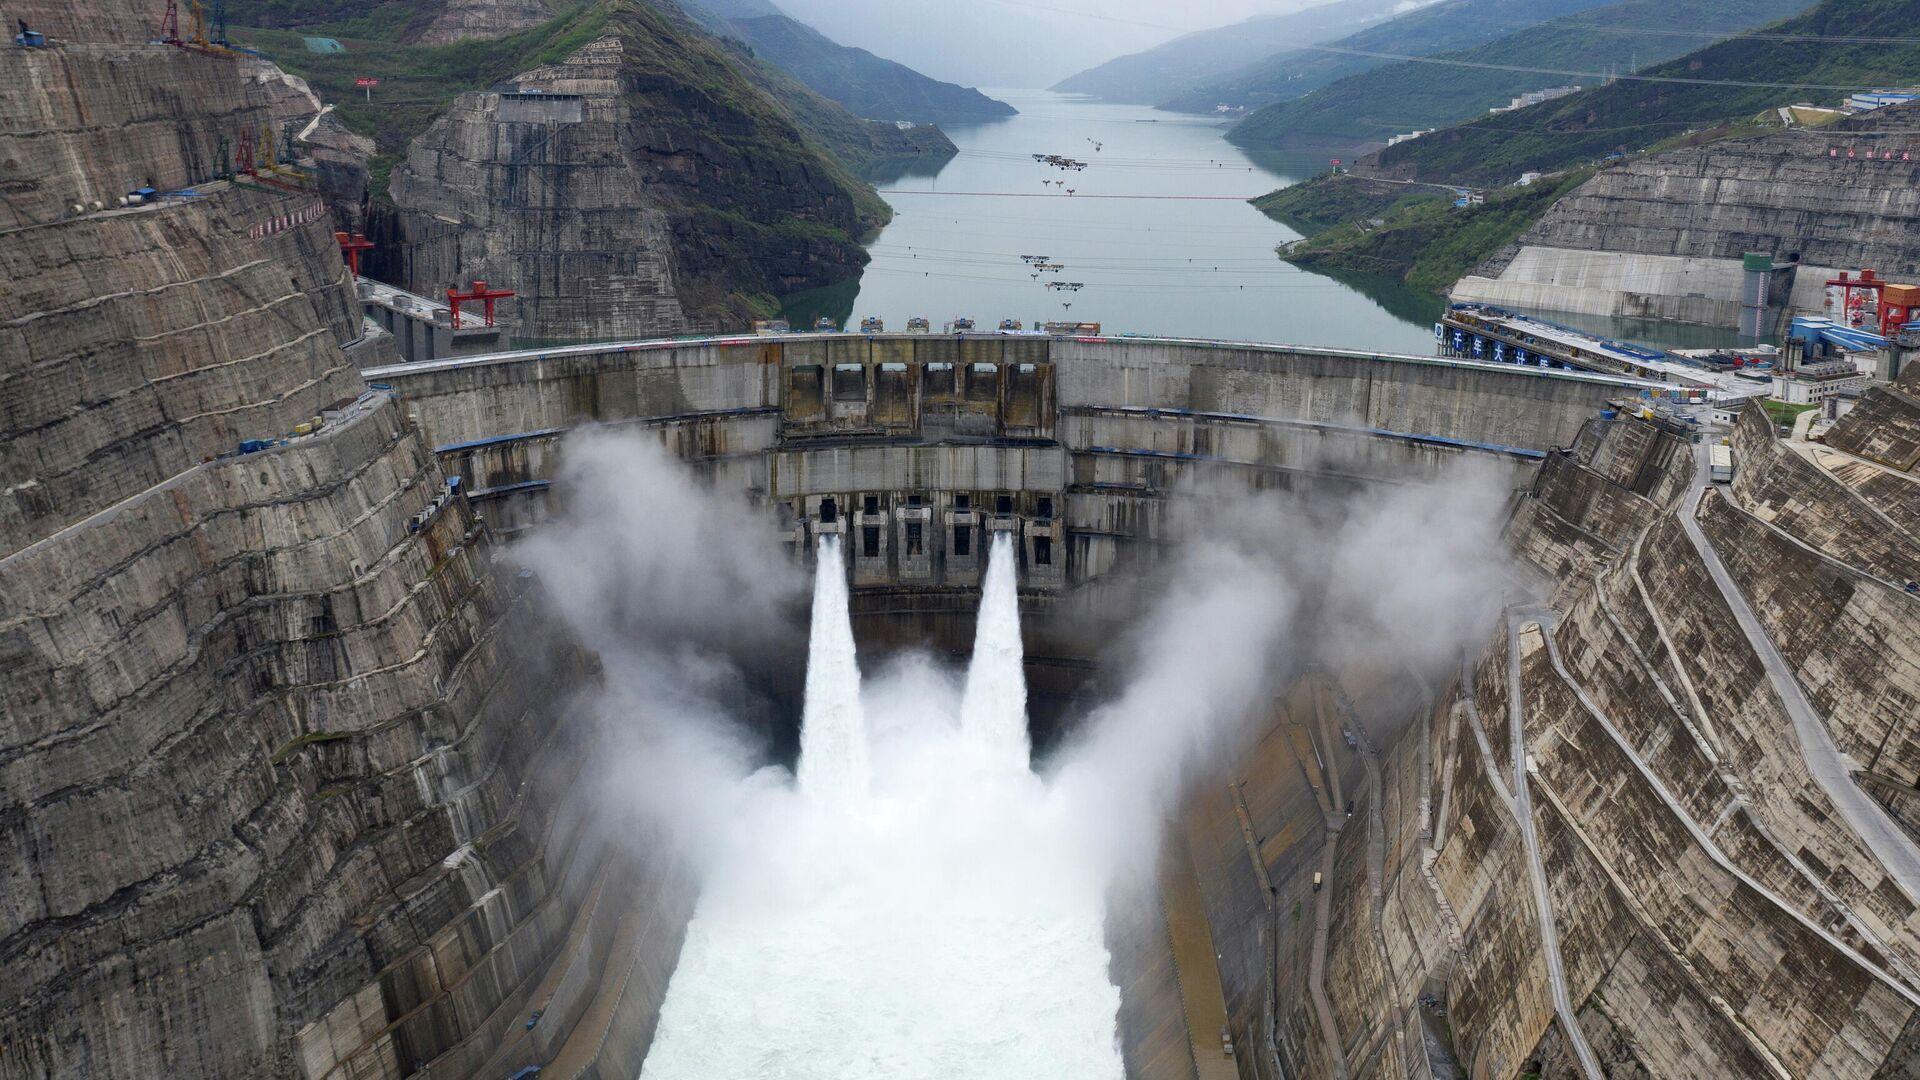 La central hidroeléctrica de Baihetan en Sichuan, en China - Sputnik Mundo, 1920, 28.06.2021